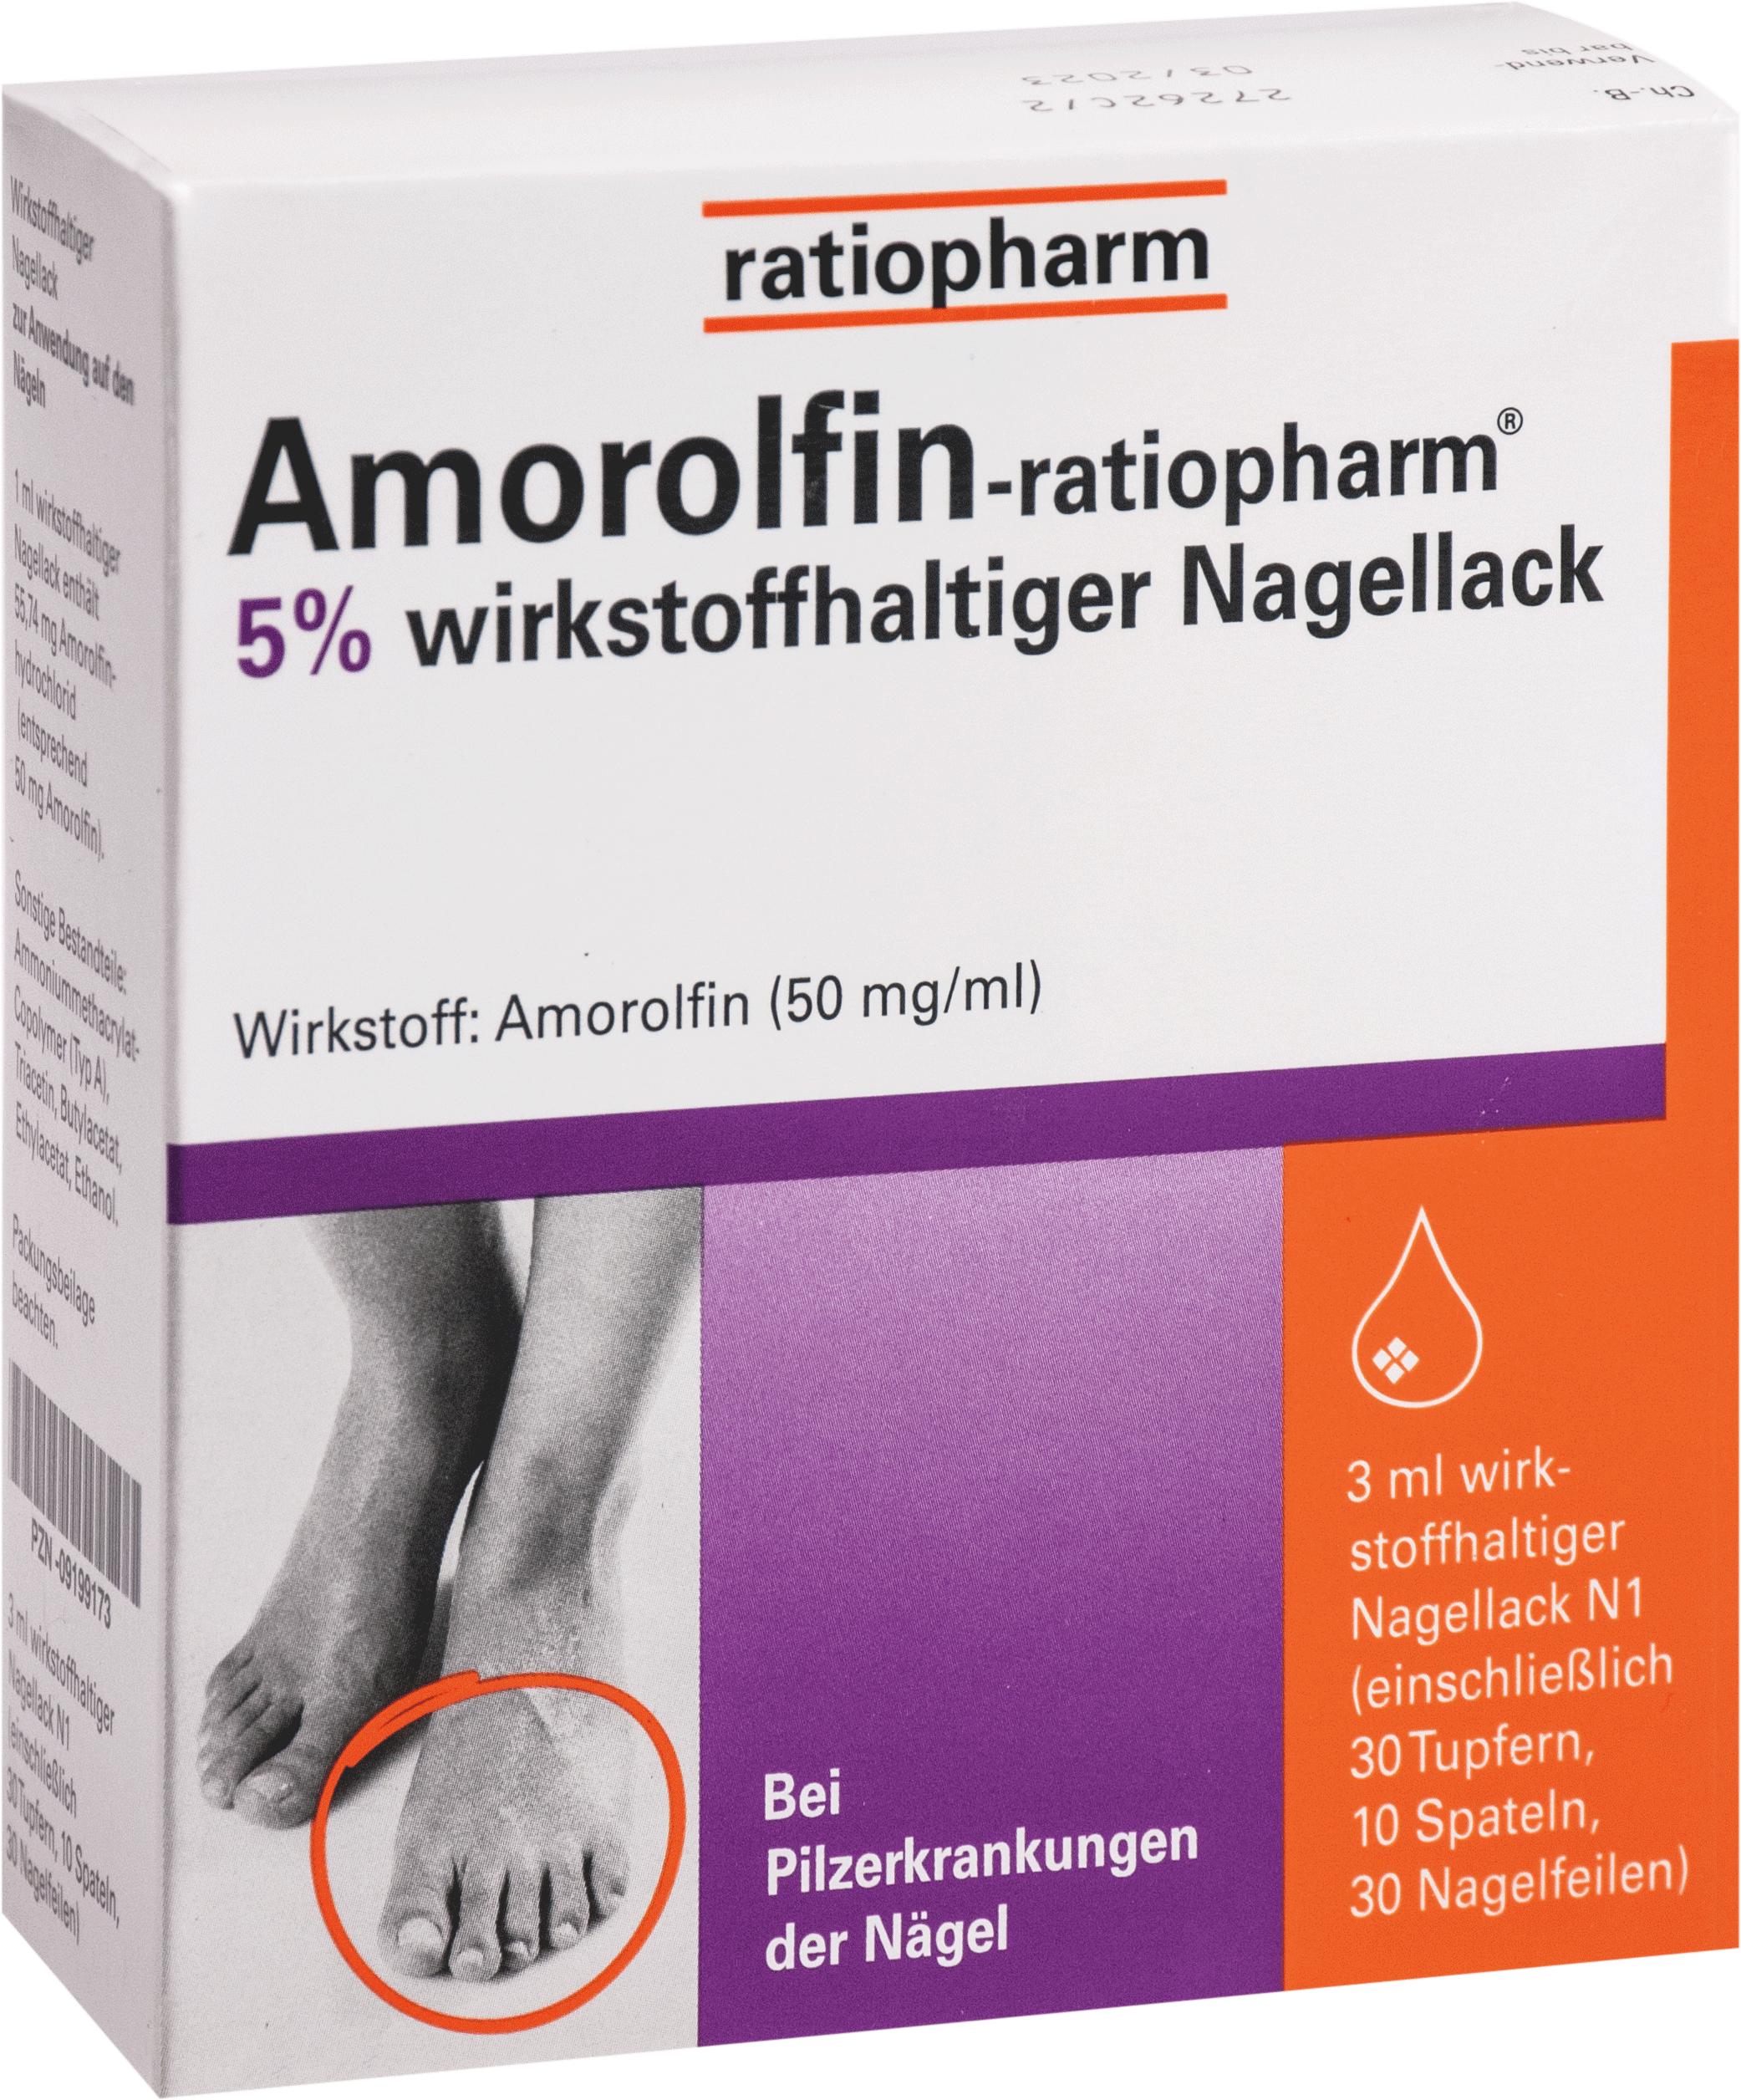 Amorolfin-ratiopharm 5% wirkstoffh. Nagellack